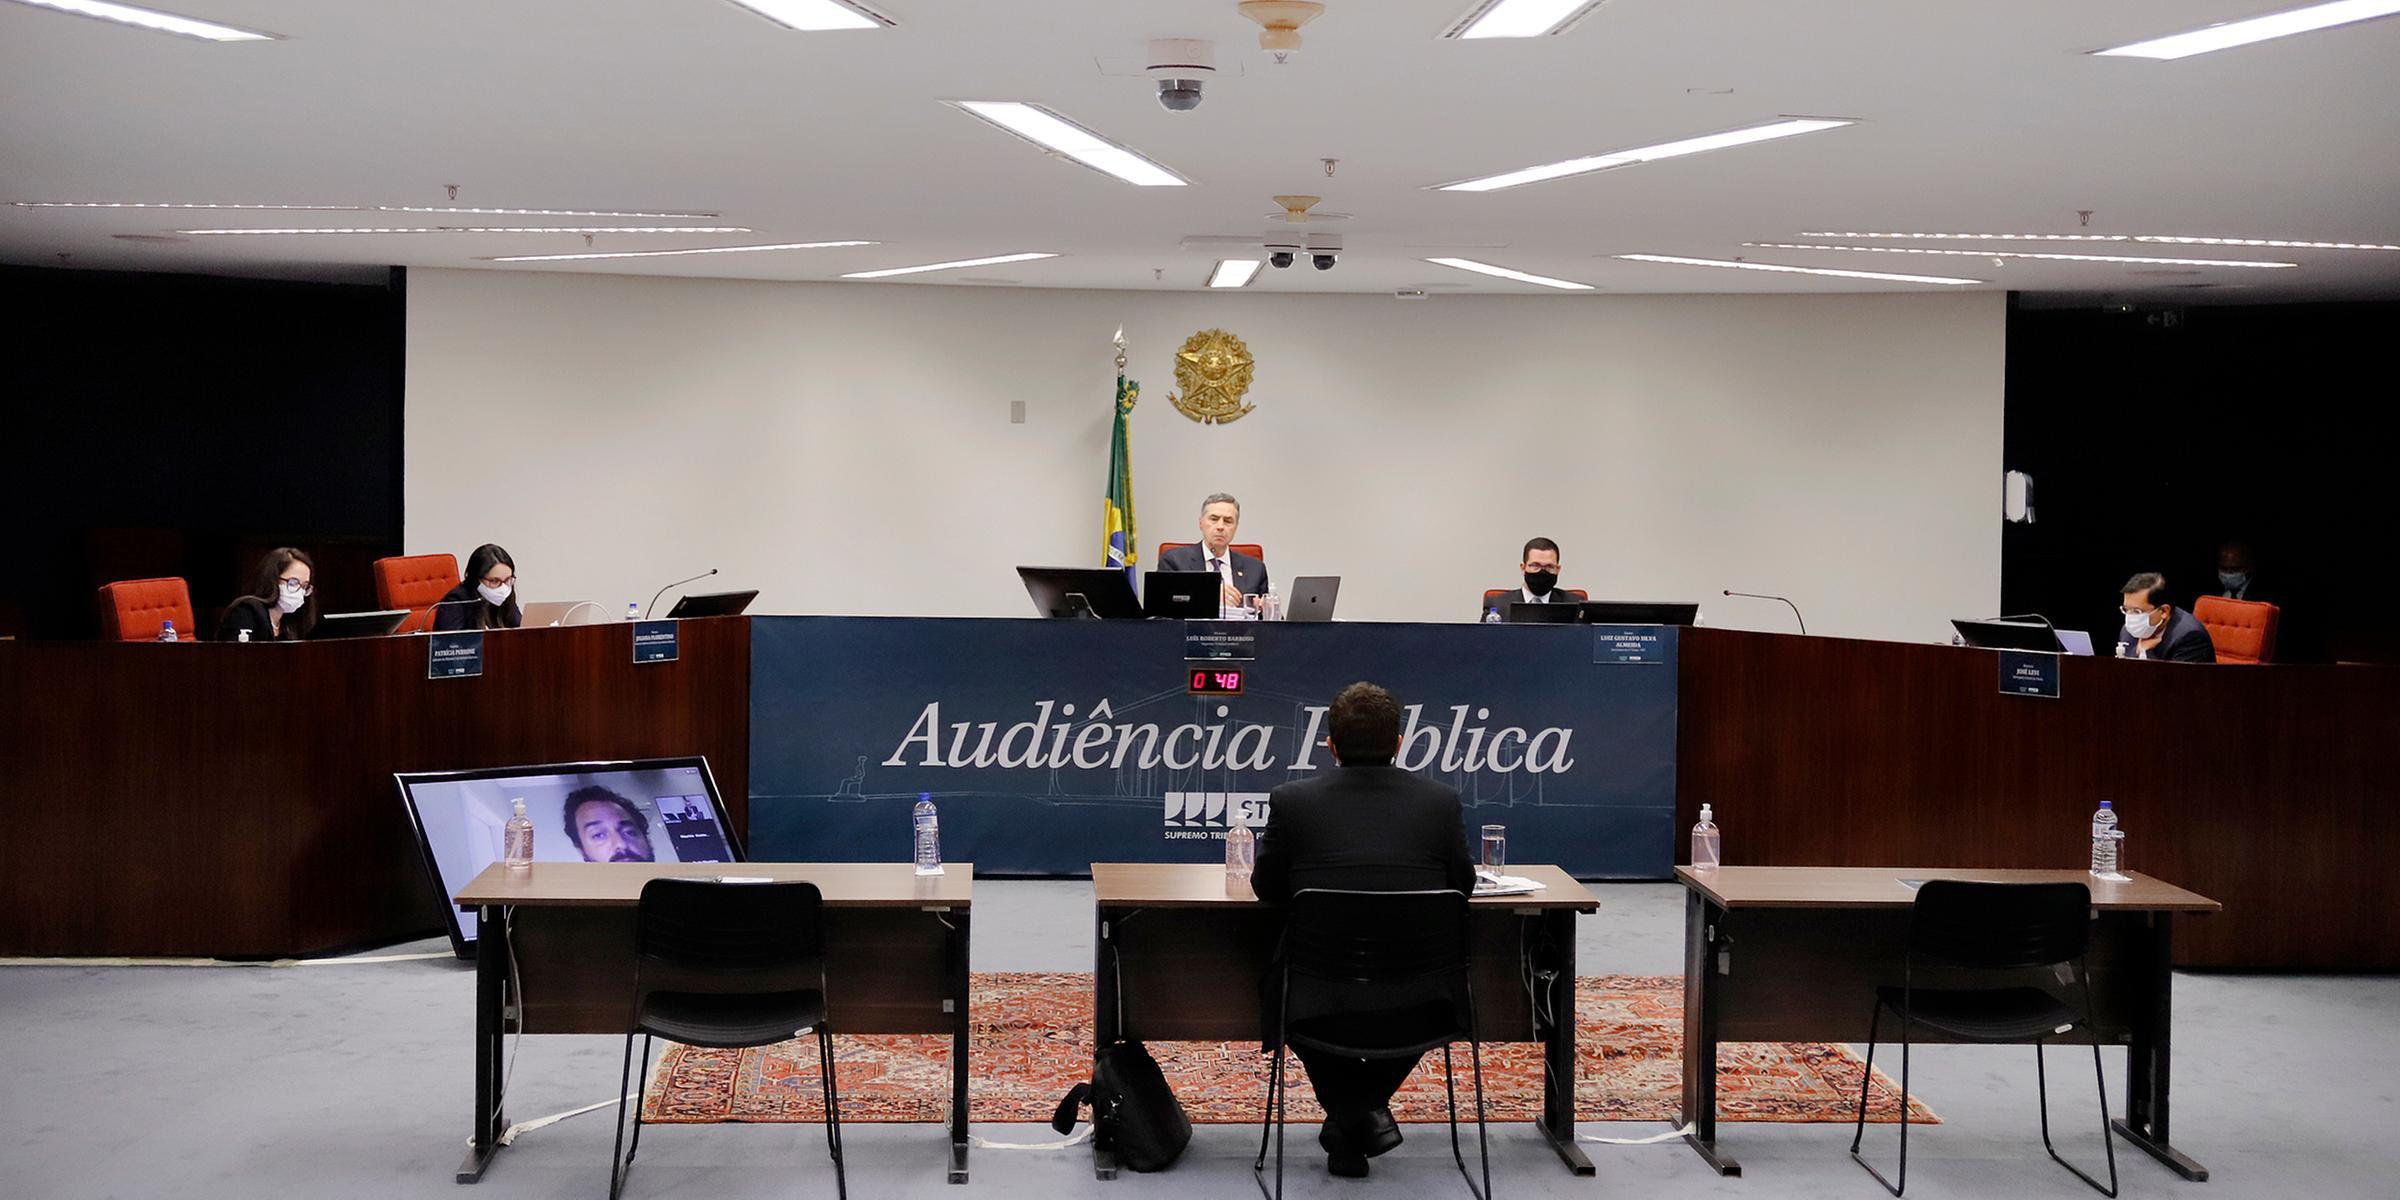 Barroso criticou ceticismo sobre o tema